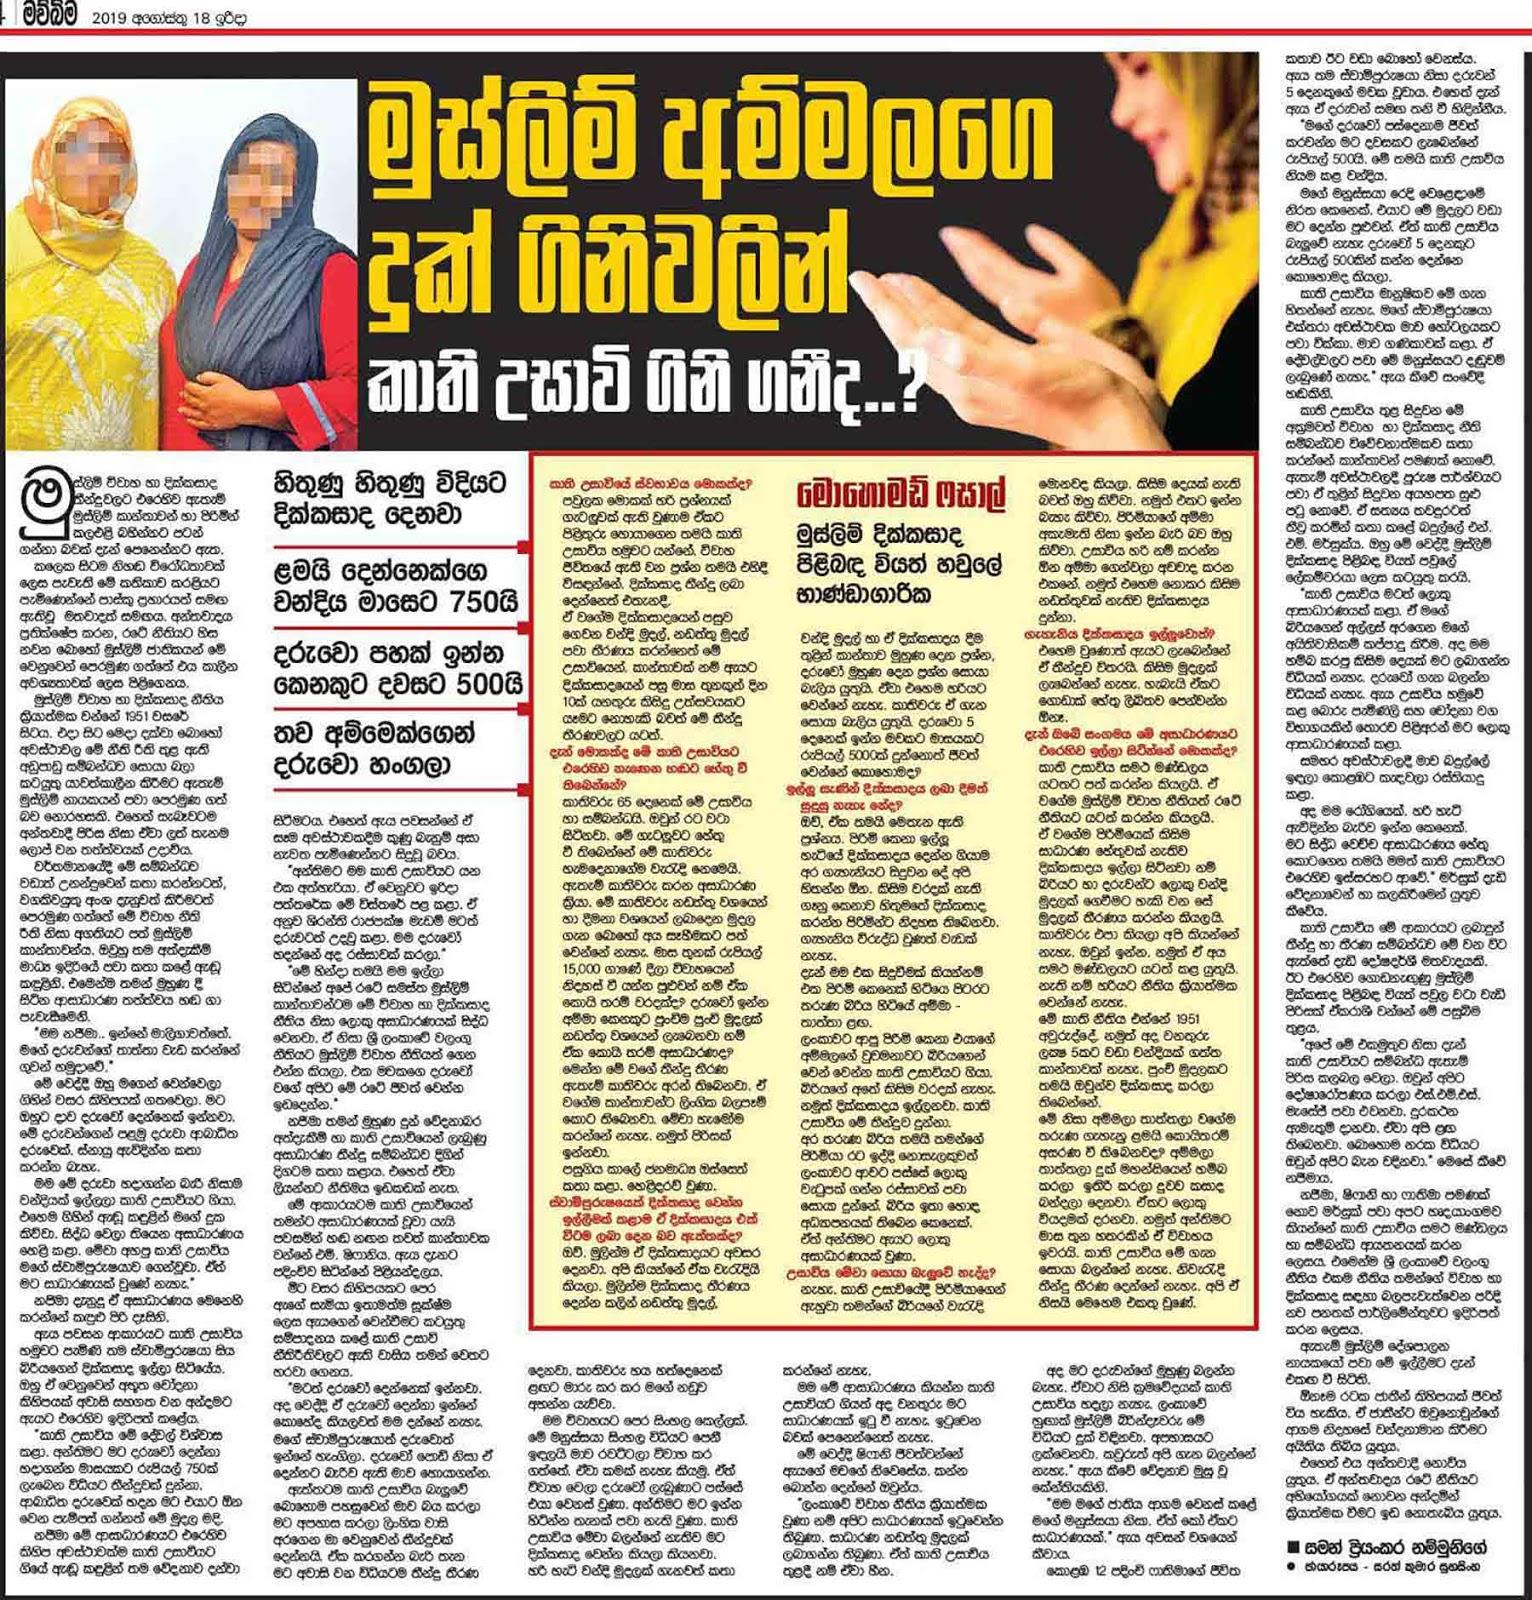 Muslim Women and Qwasi Court